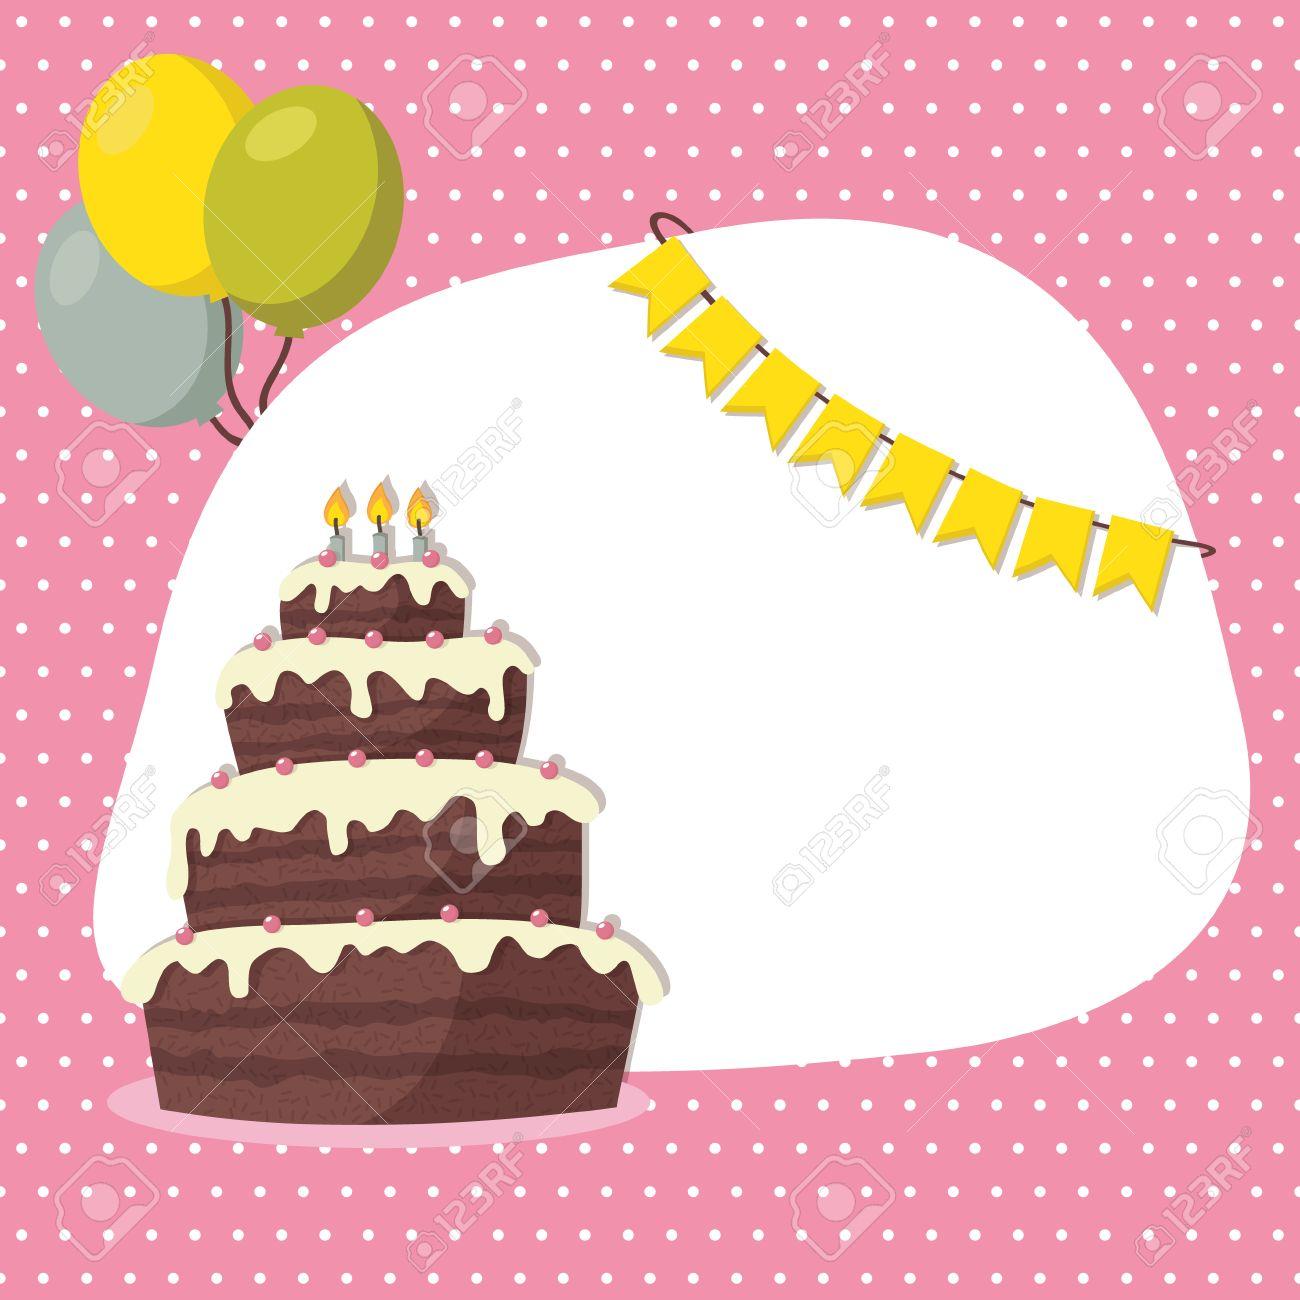 Birthday Invitation Card For Girl Royalty Free Cliparts, Vectors ...